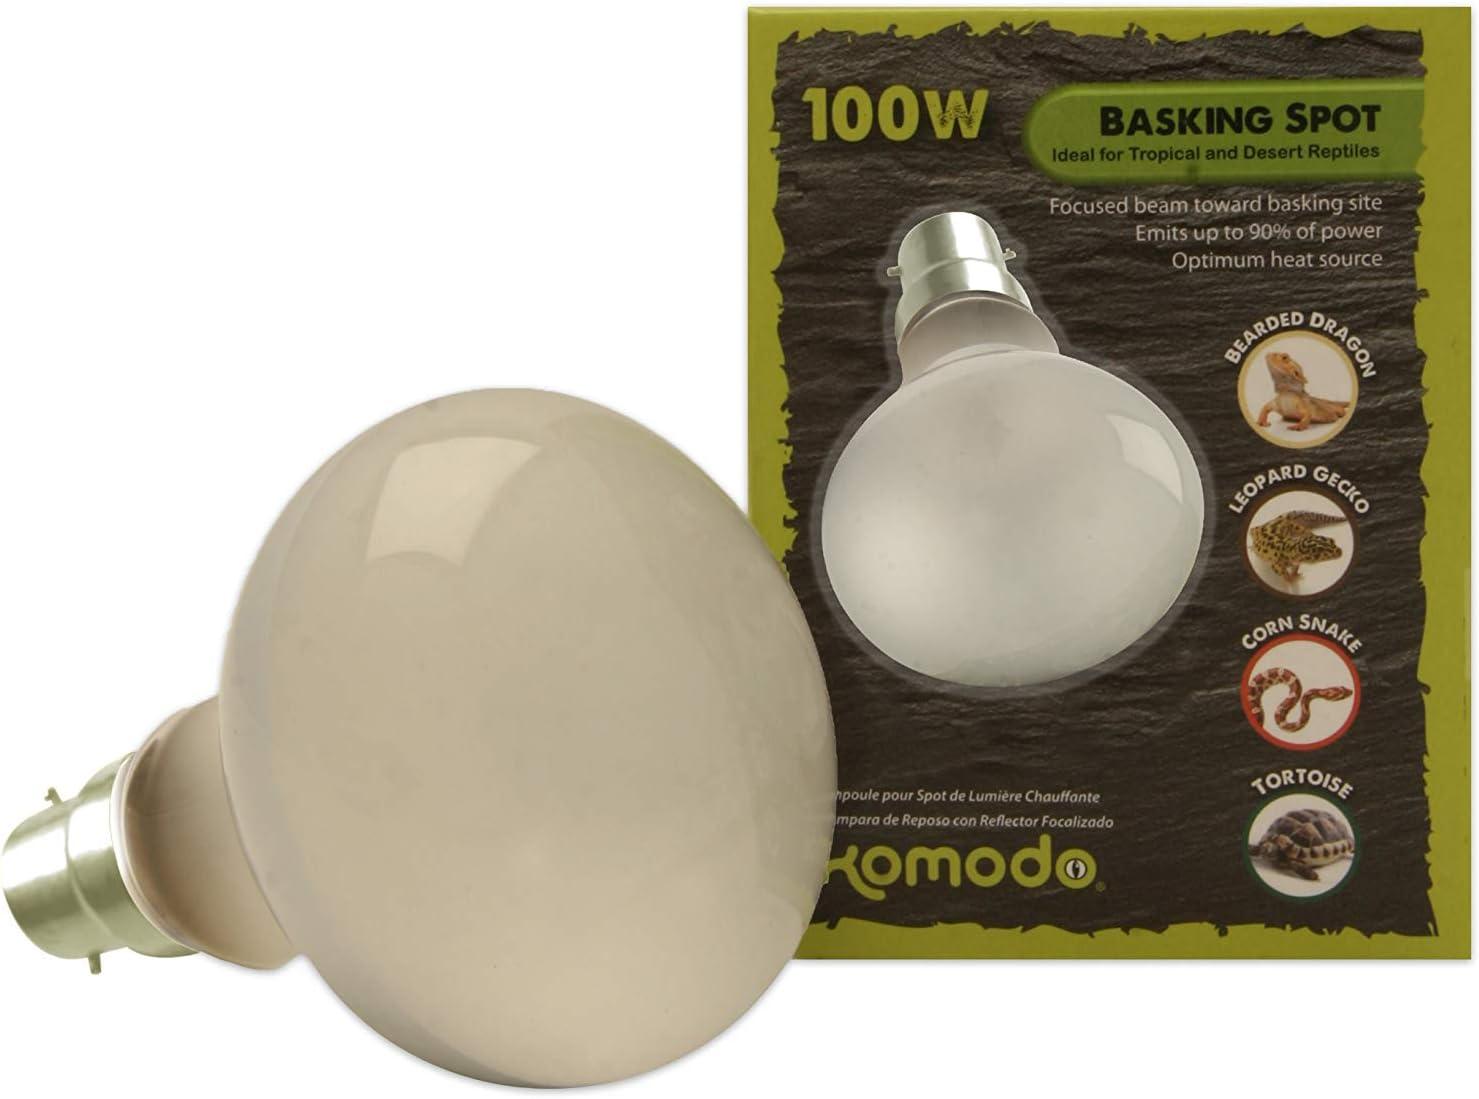 Komodo 100 Watt Basking Spot Bulb